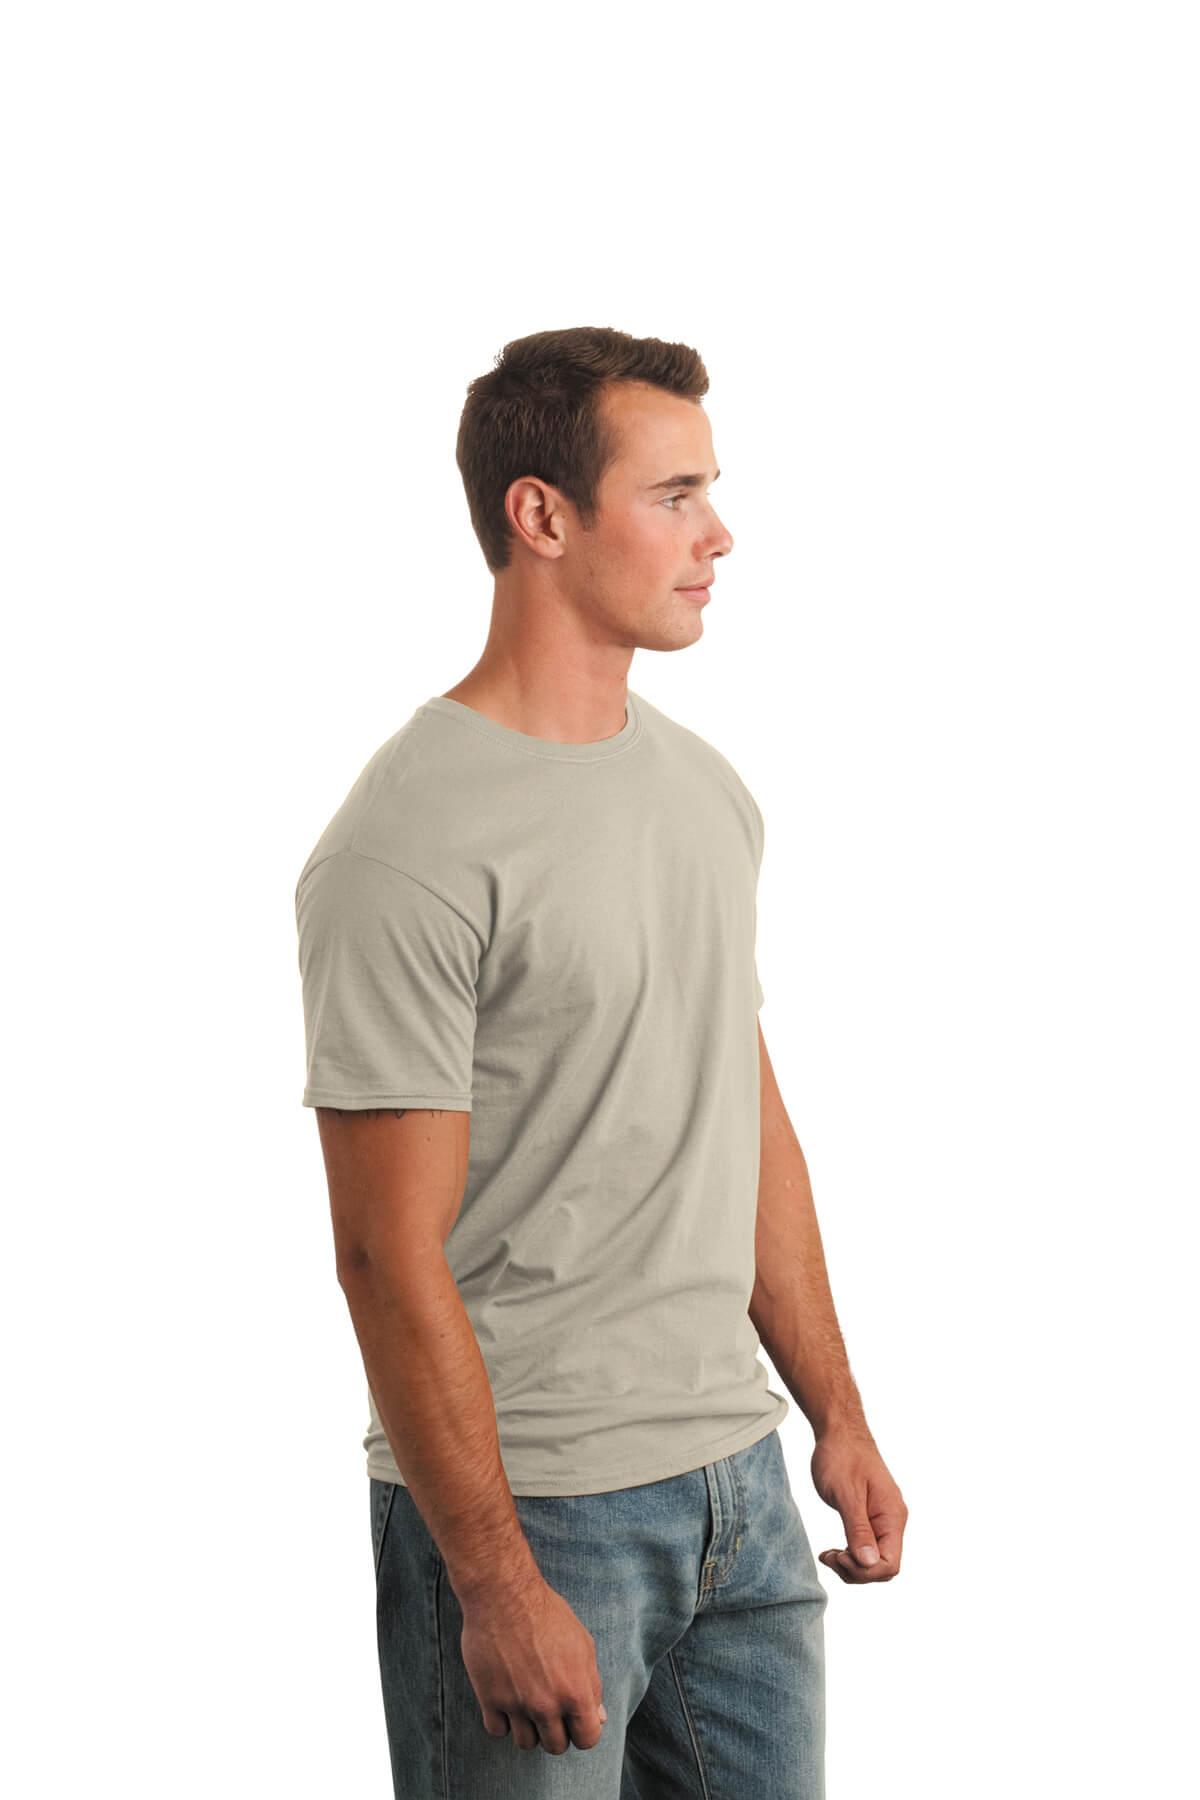 Sand T-Shirt Model Side